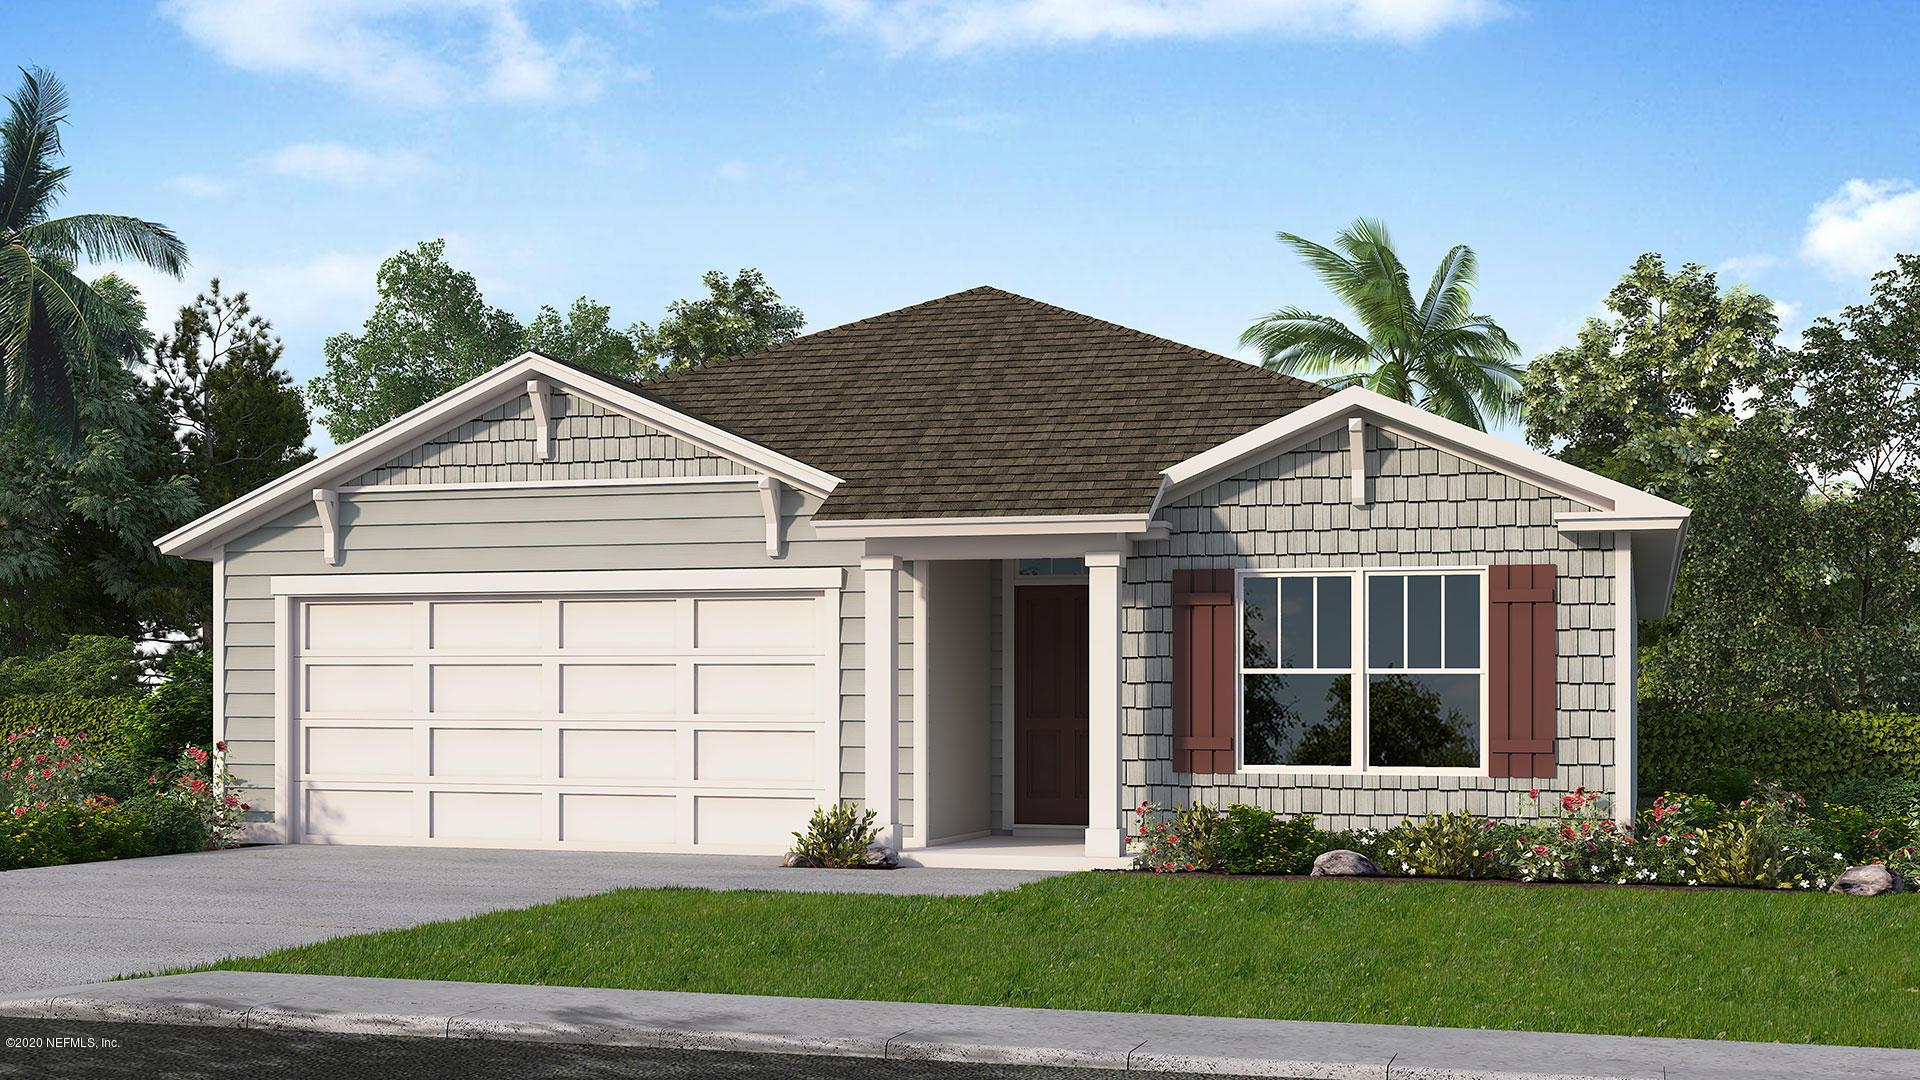 6439 BUCKING BRONCO, JACKSONVILLE, FLORIDA 32234, 3 Bedrooms Bedrooms, ,2 BathroomsBathrooms,Residential,For sale,BUCKING BRONCO,1080519